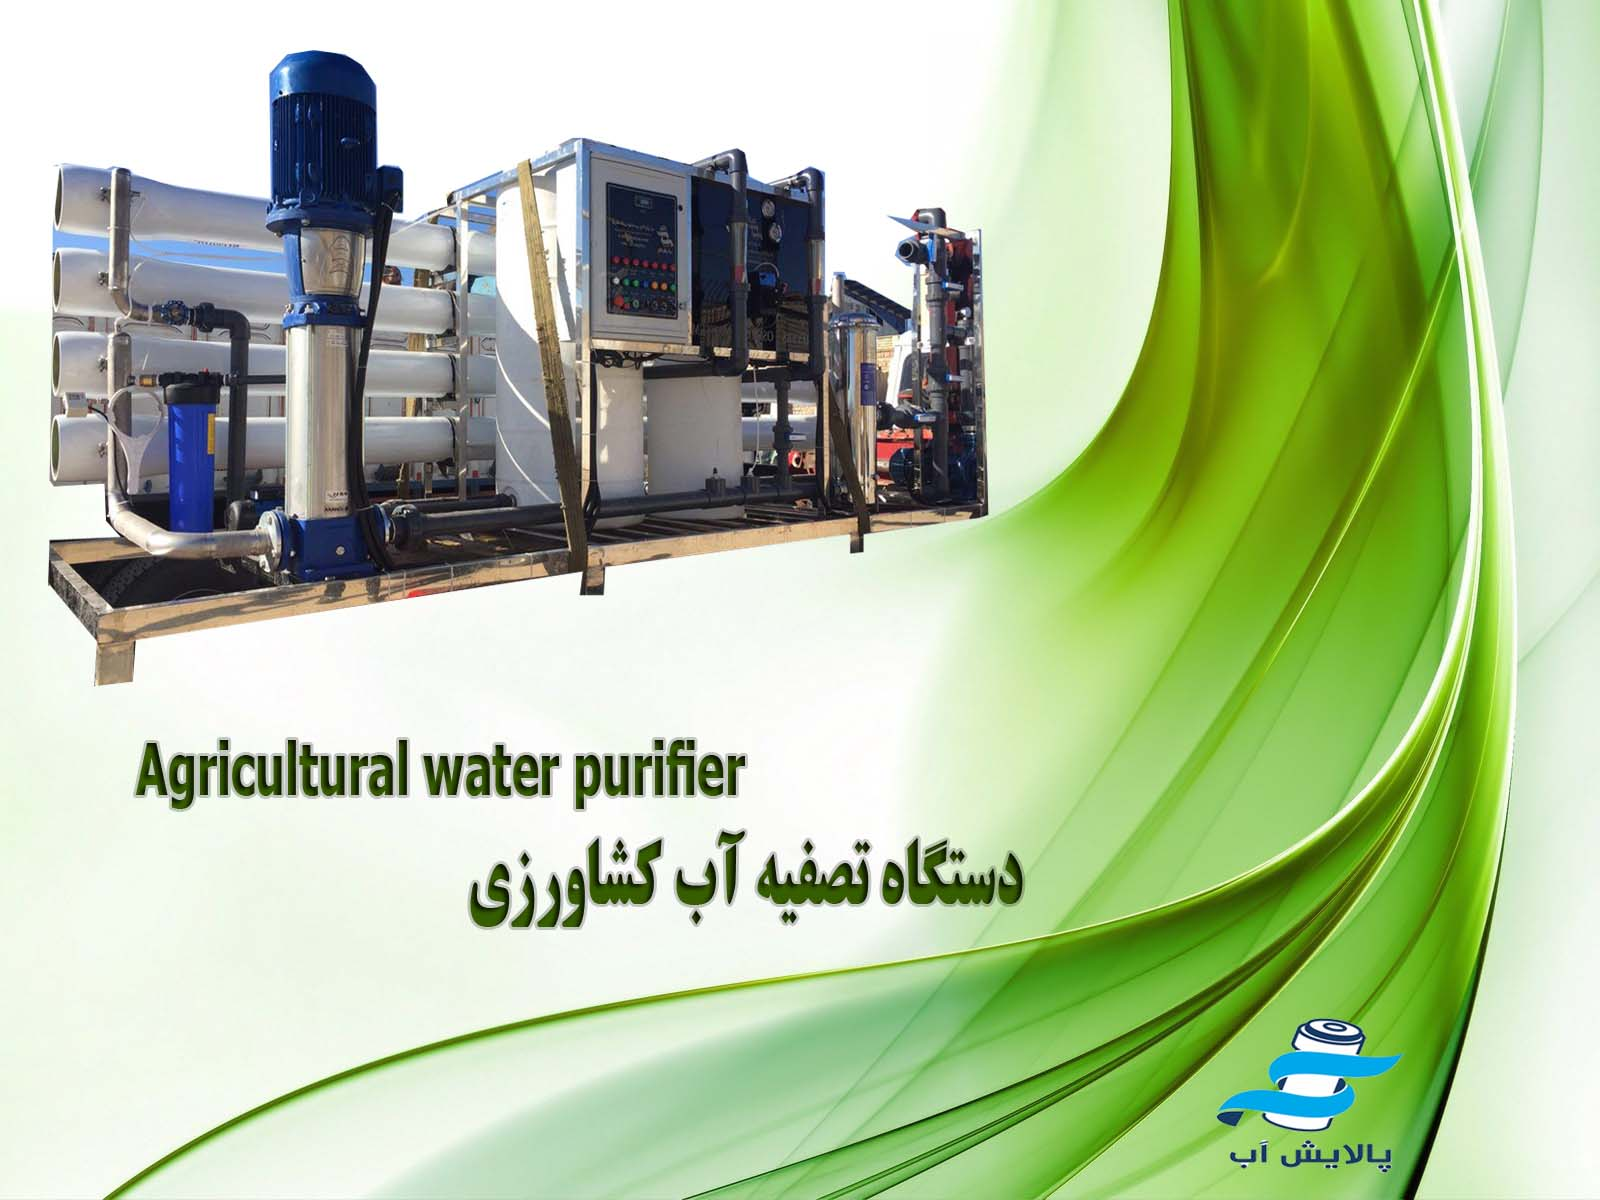 اهمیت تصفیه آب در صنعت کشاورزی